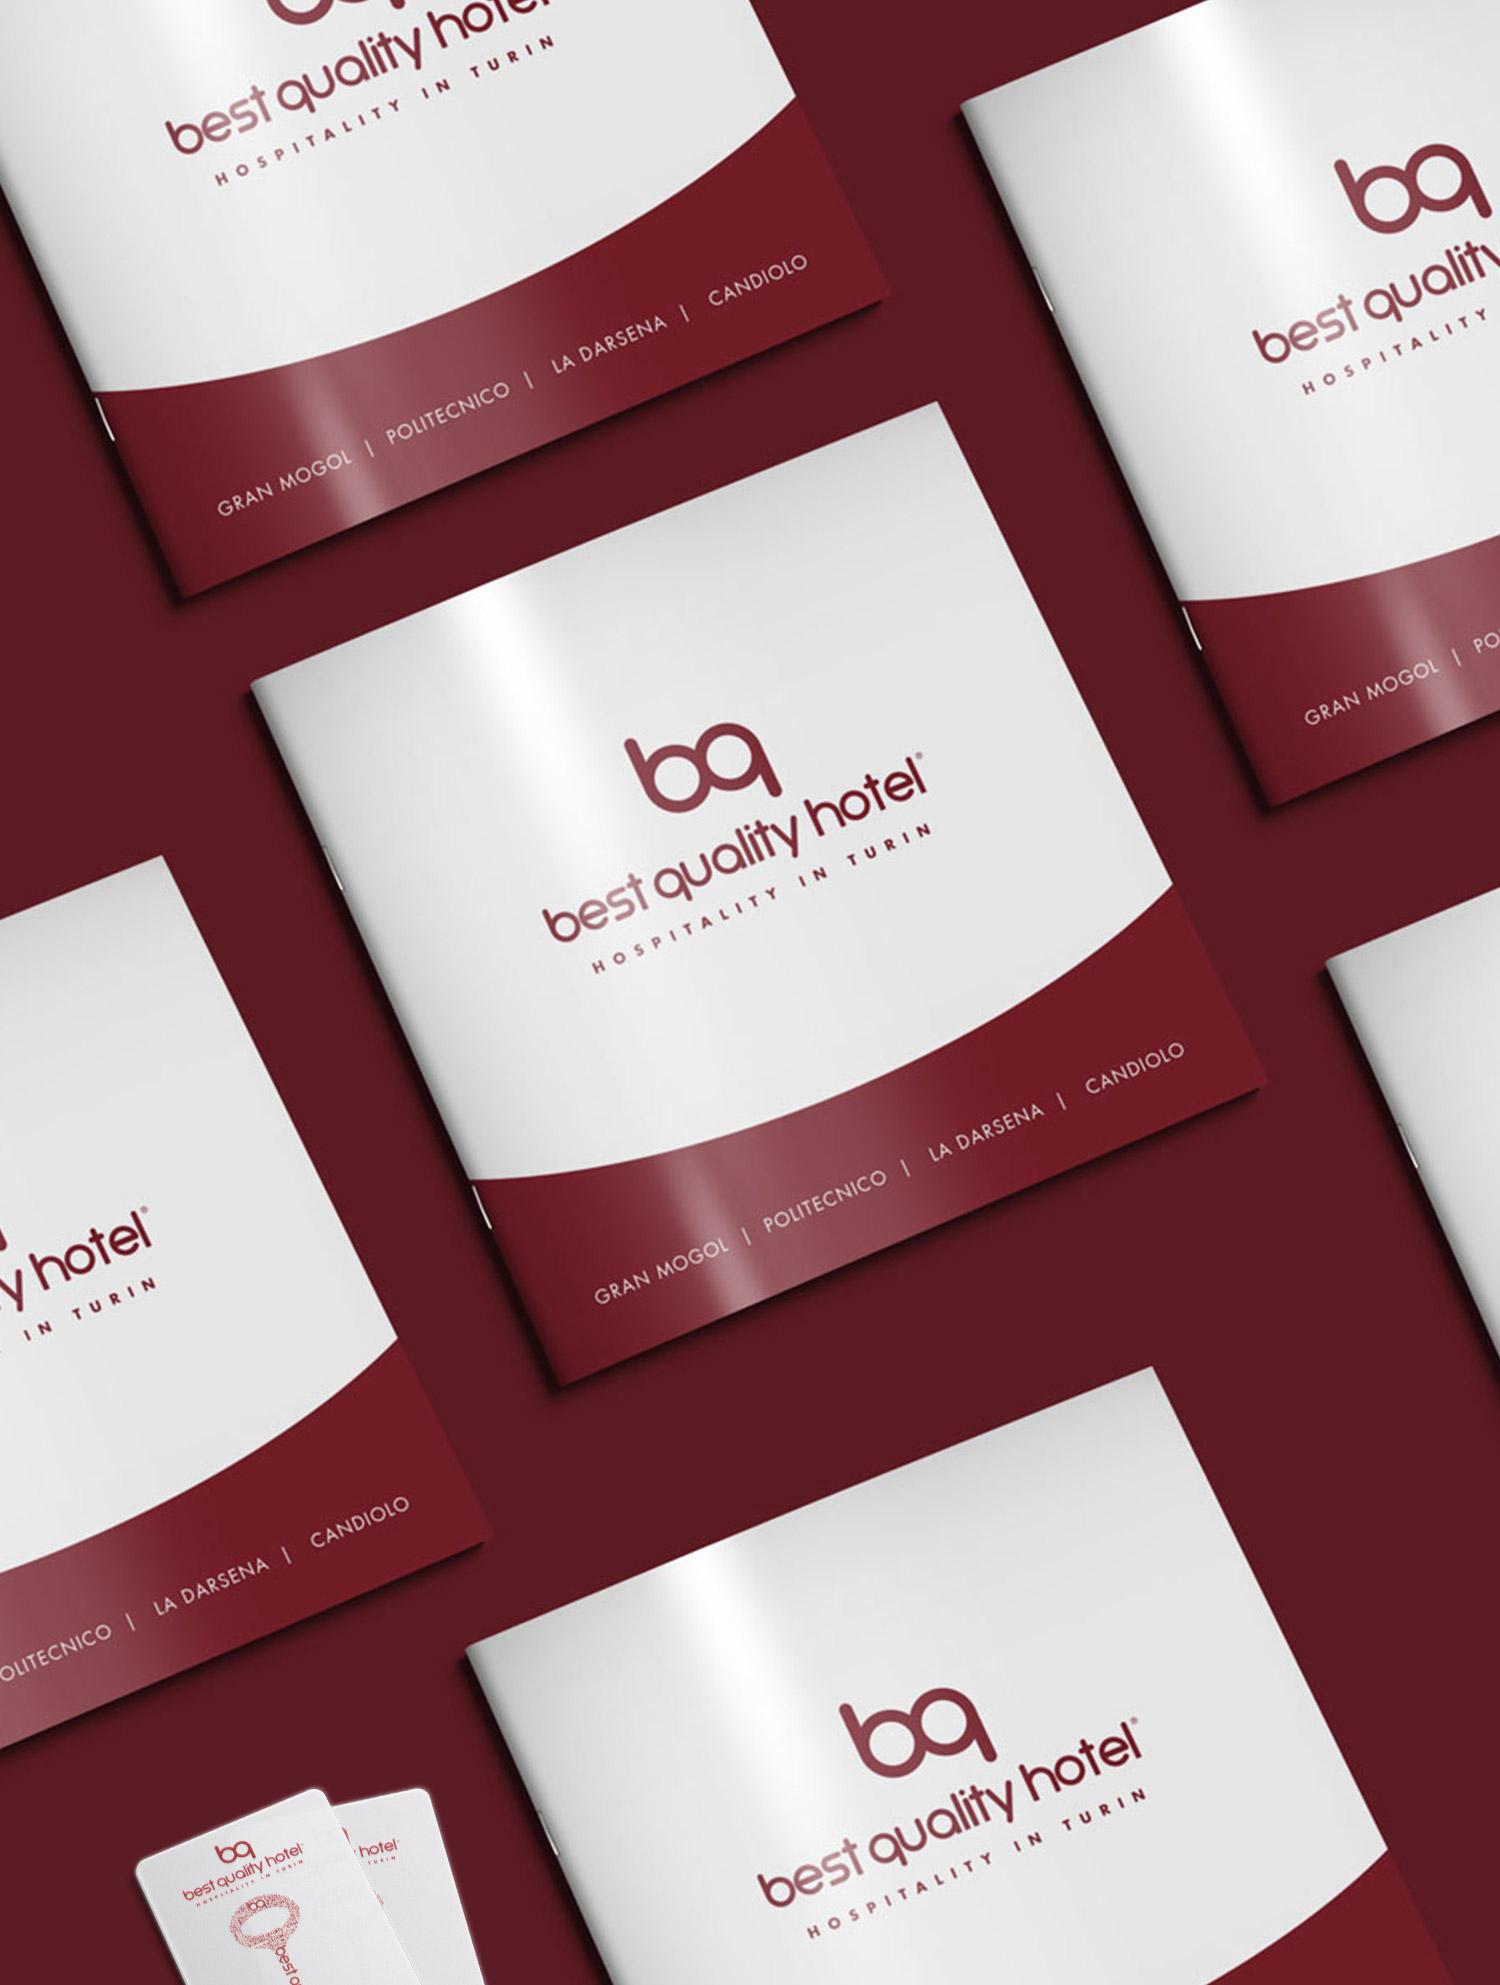 bq-hotel-brochure-03